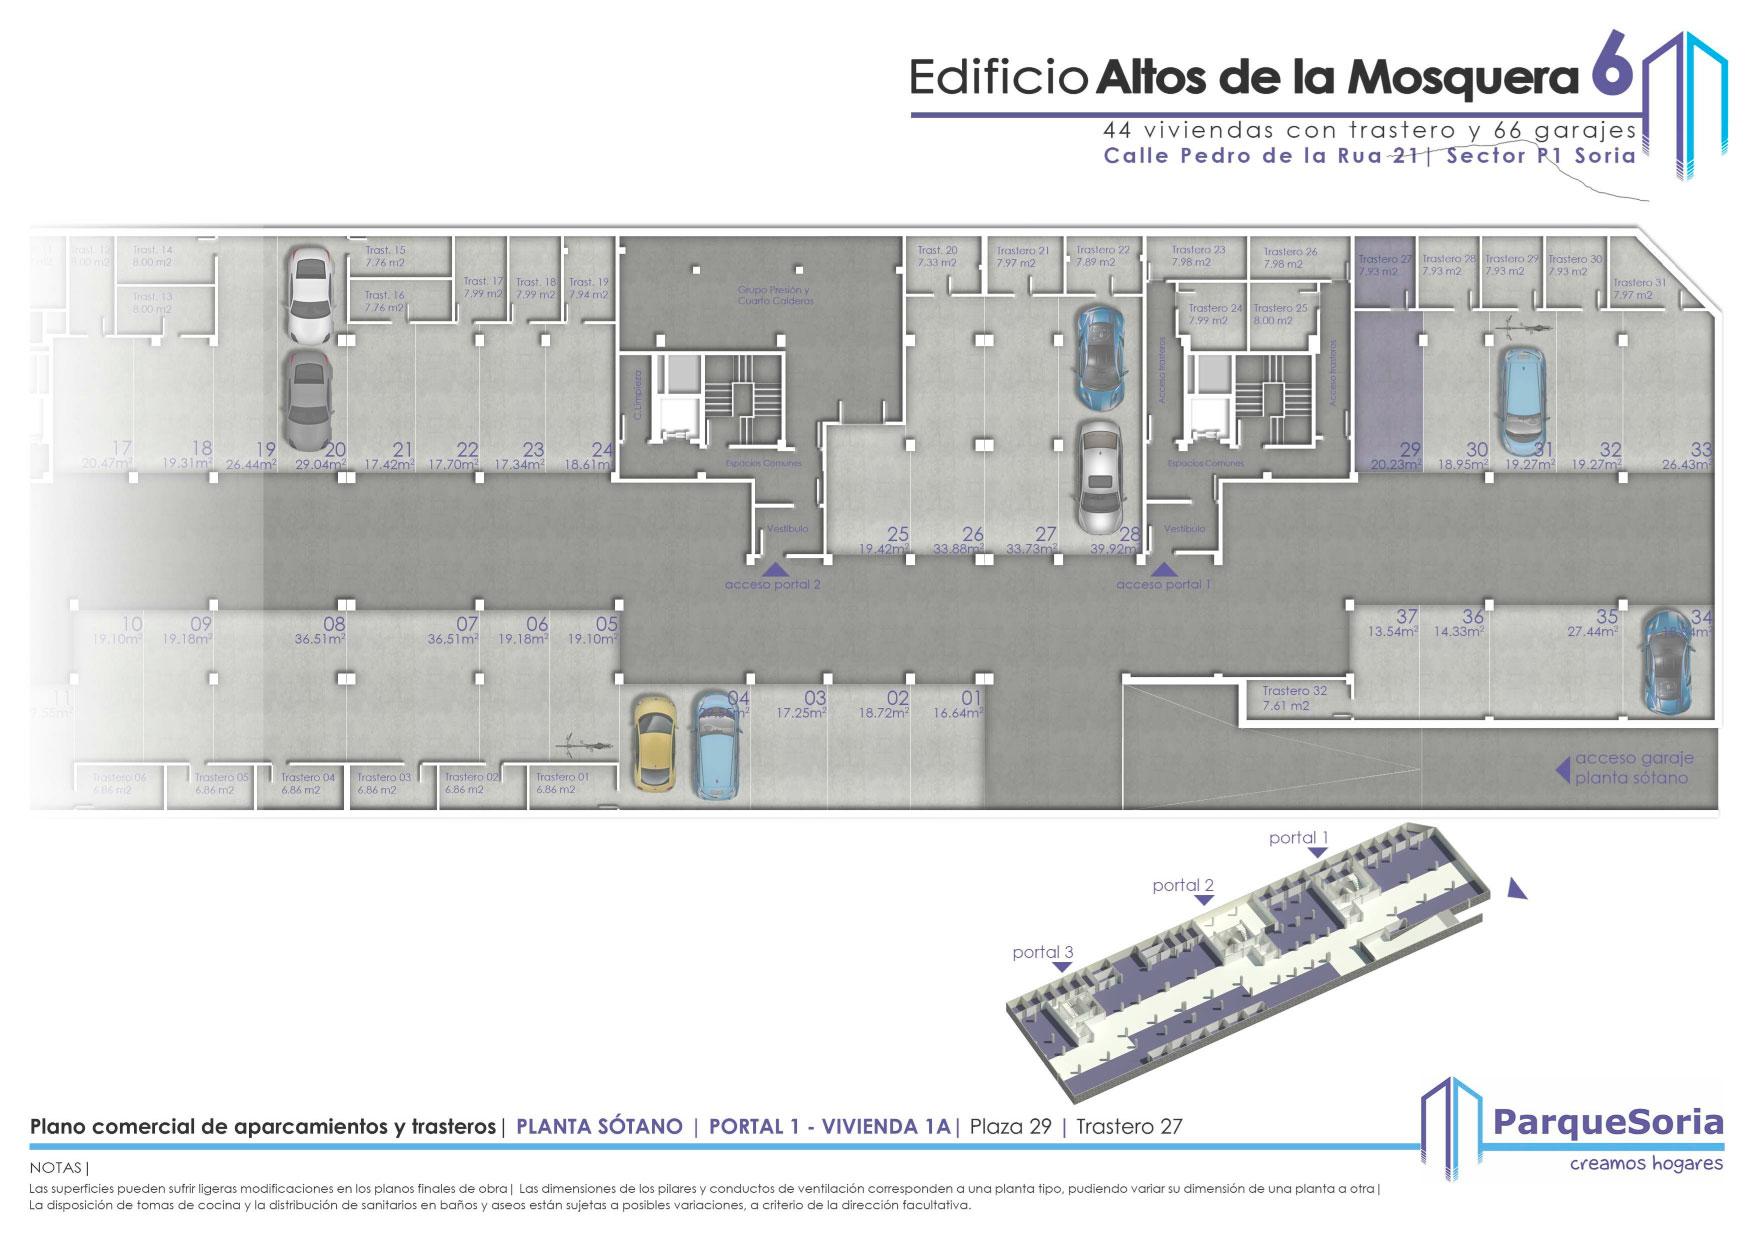 Parquesoria-Altos-de-la-mosquera-6-1A-3